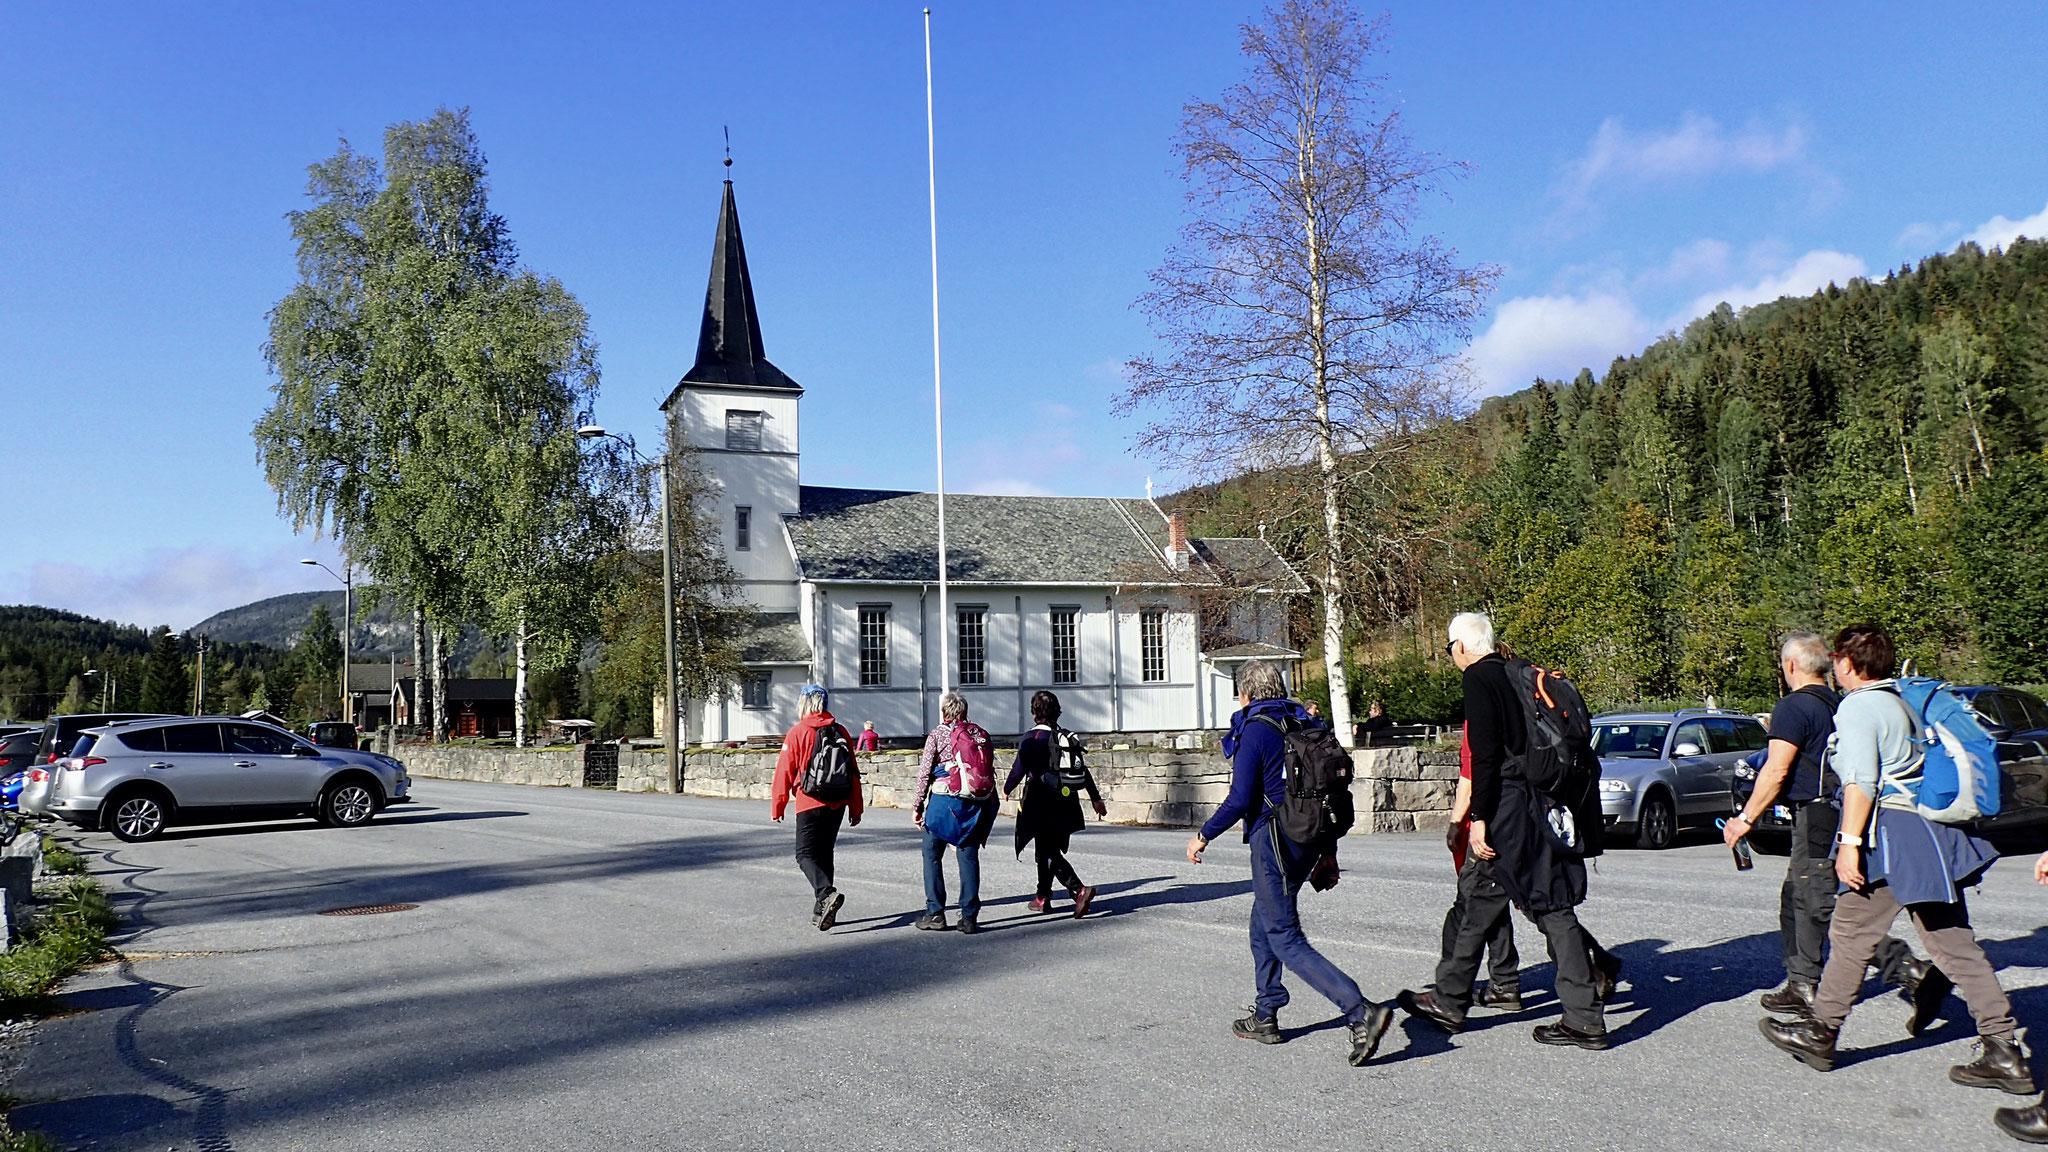 Austbygde Kirche